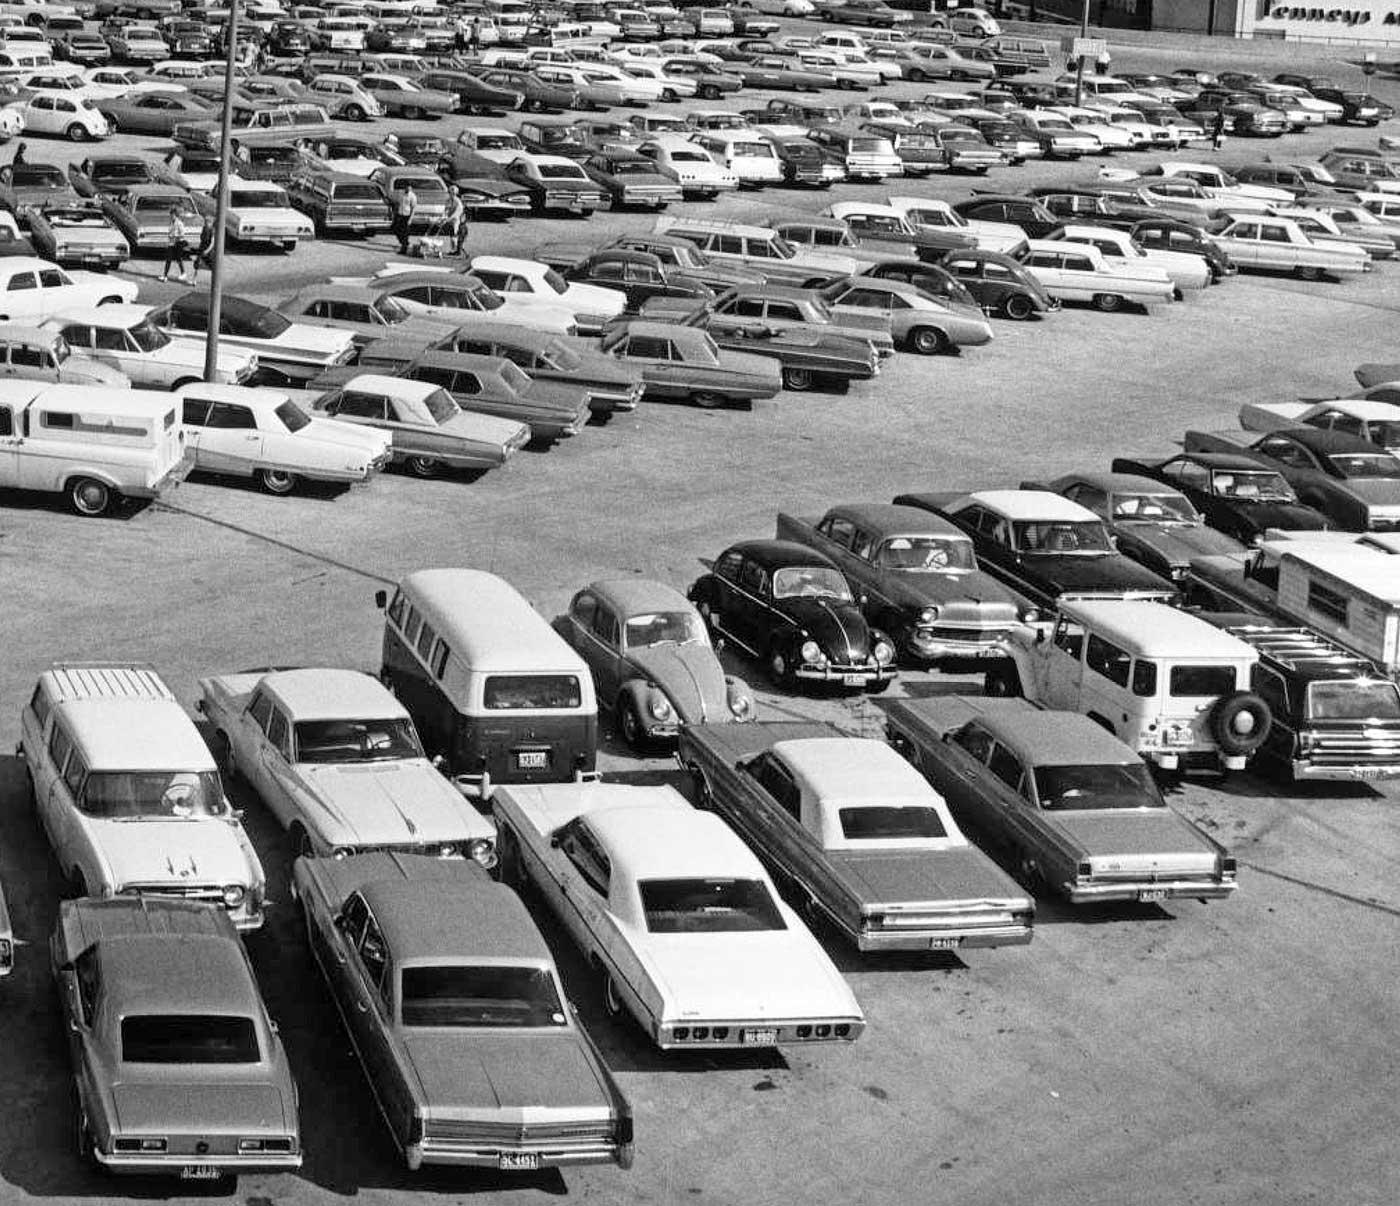 Parking Lot Series: Cinderella City Shopping Mall